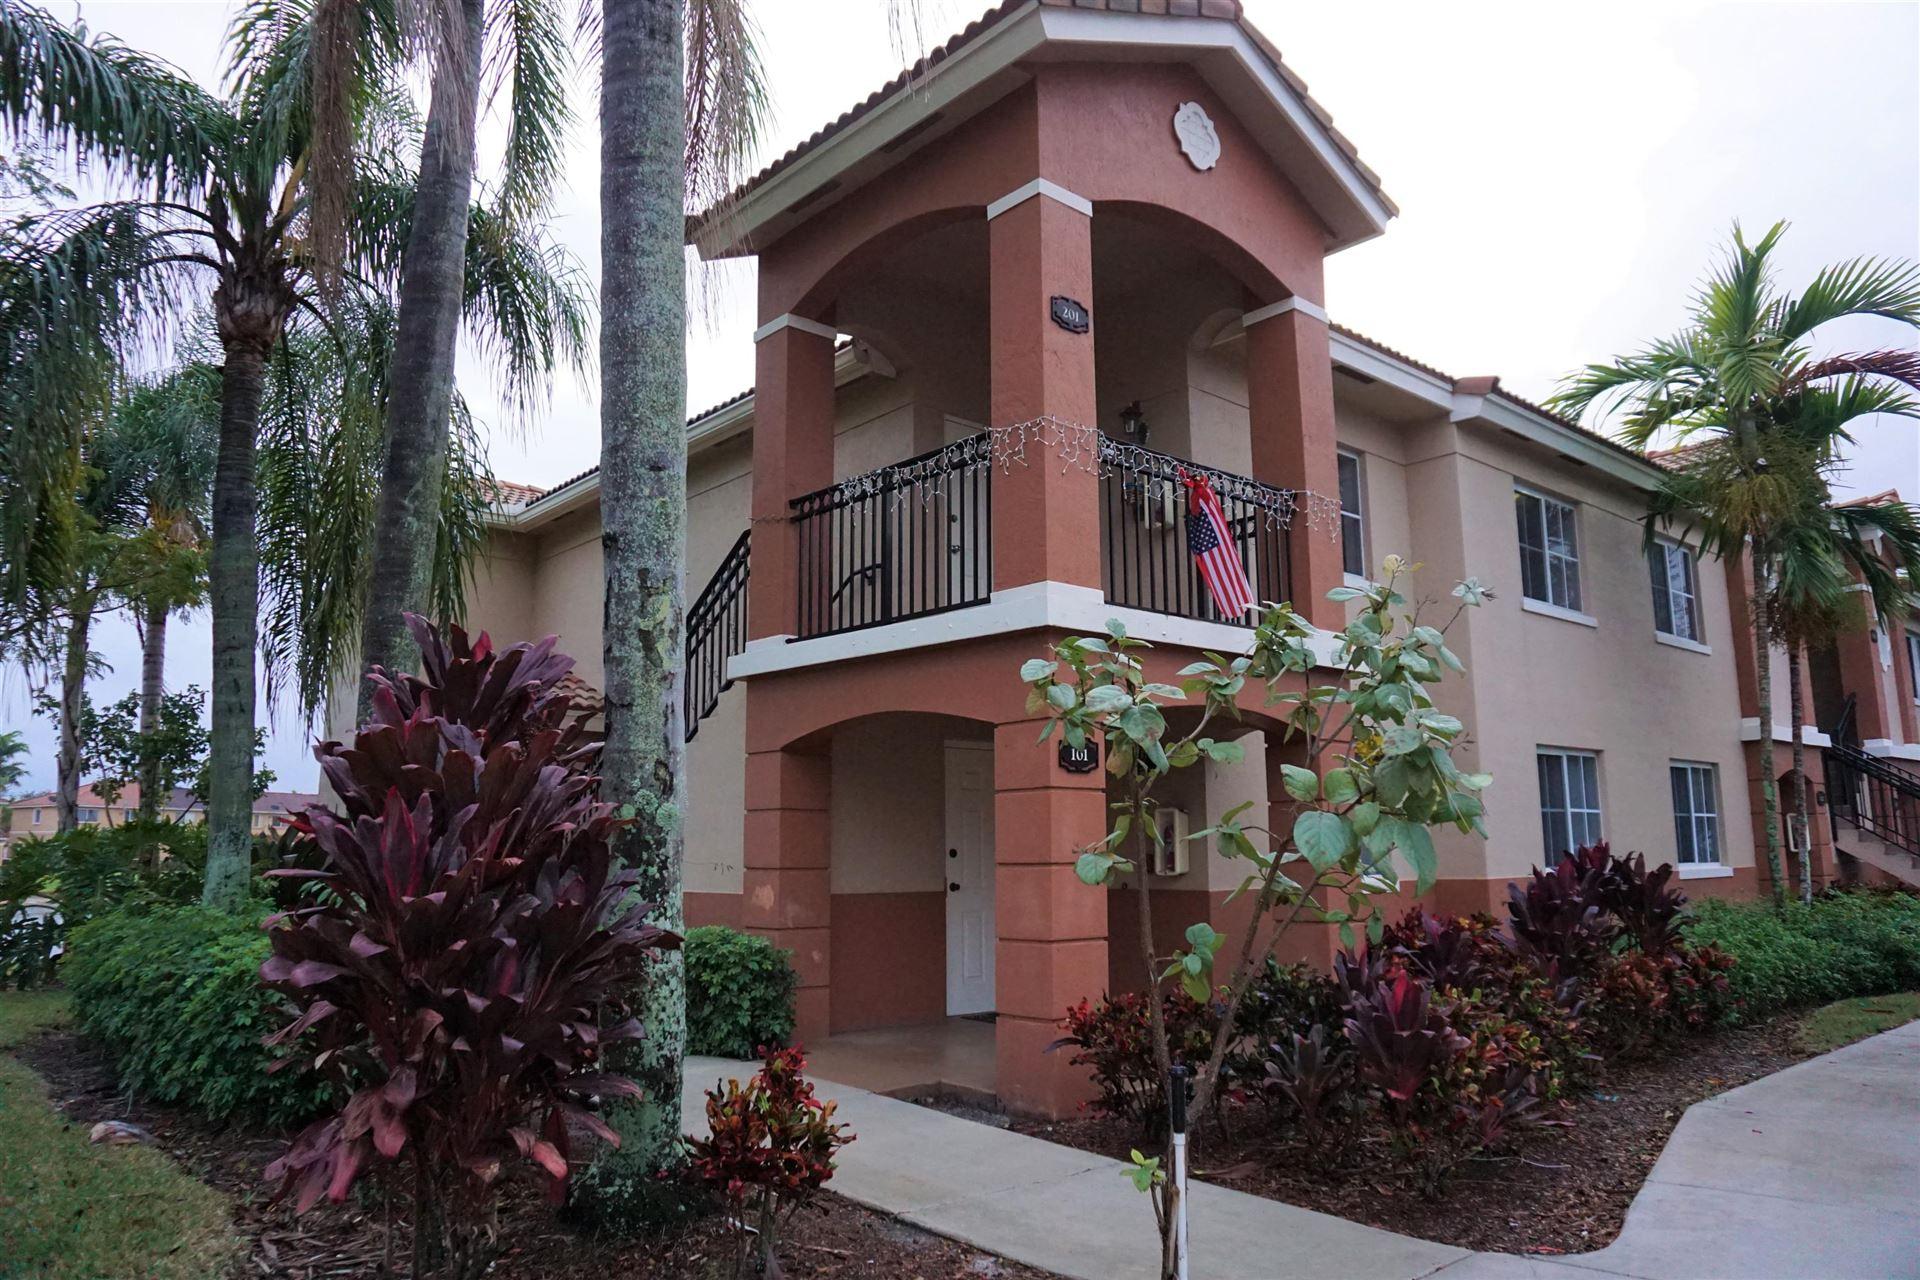 Photo of 3486 Briar Bay Boulevard #101, West Palm Beach, FL 33411 (MLS # RX-10635726)